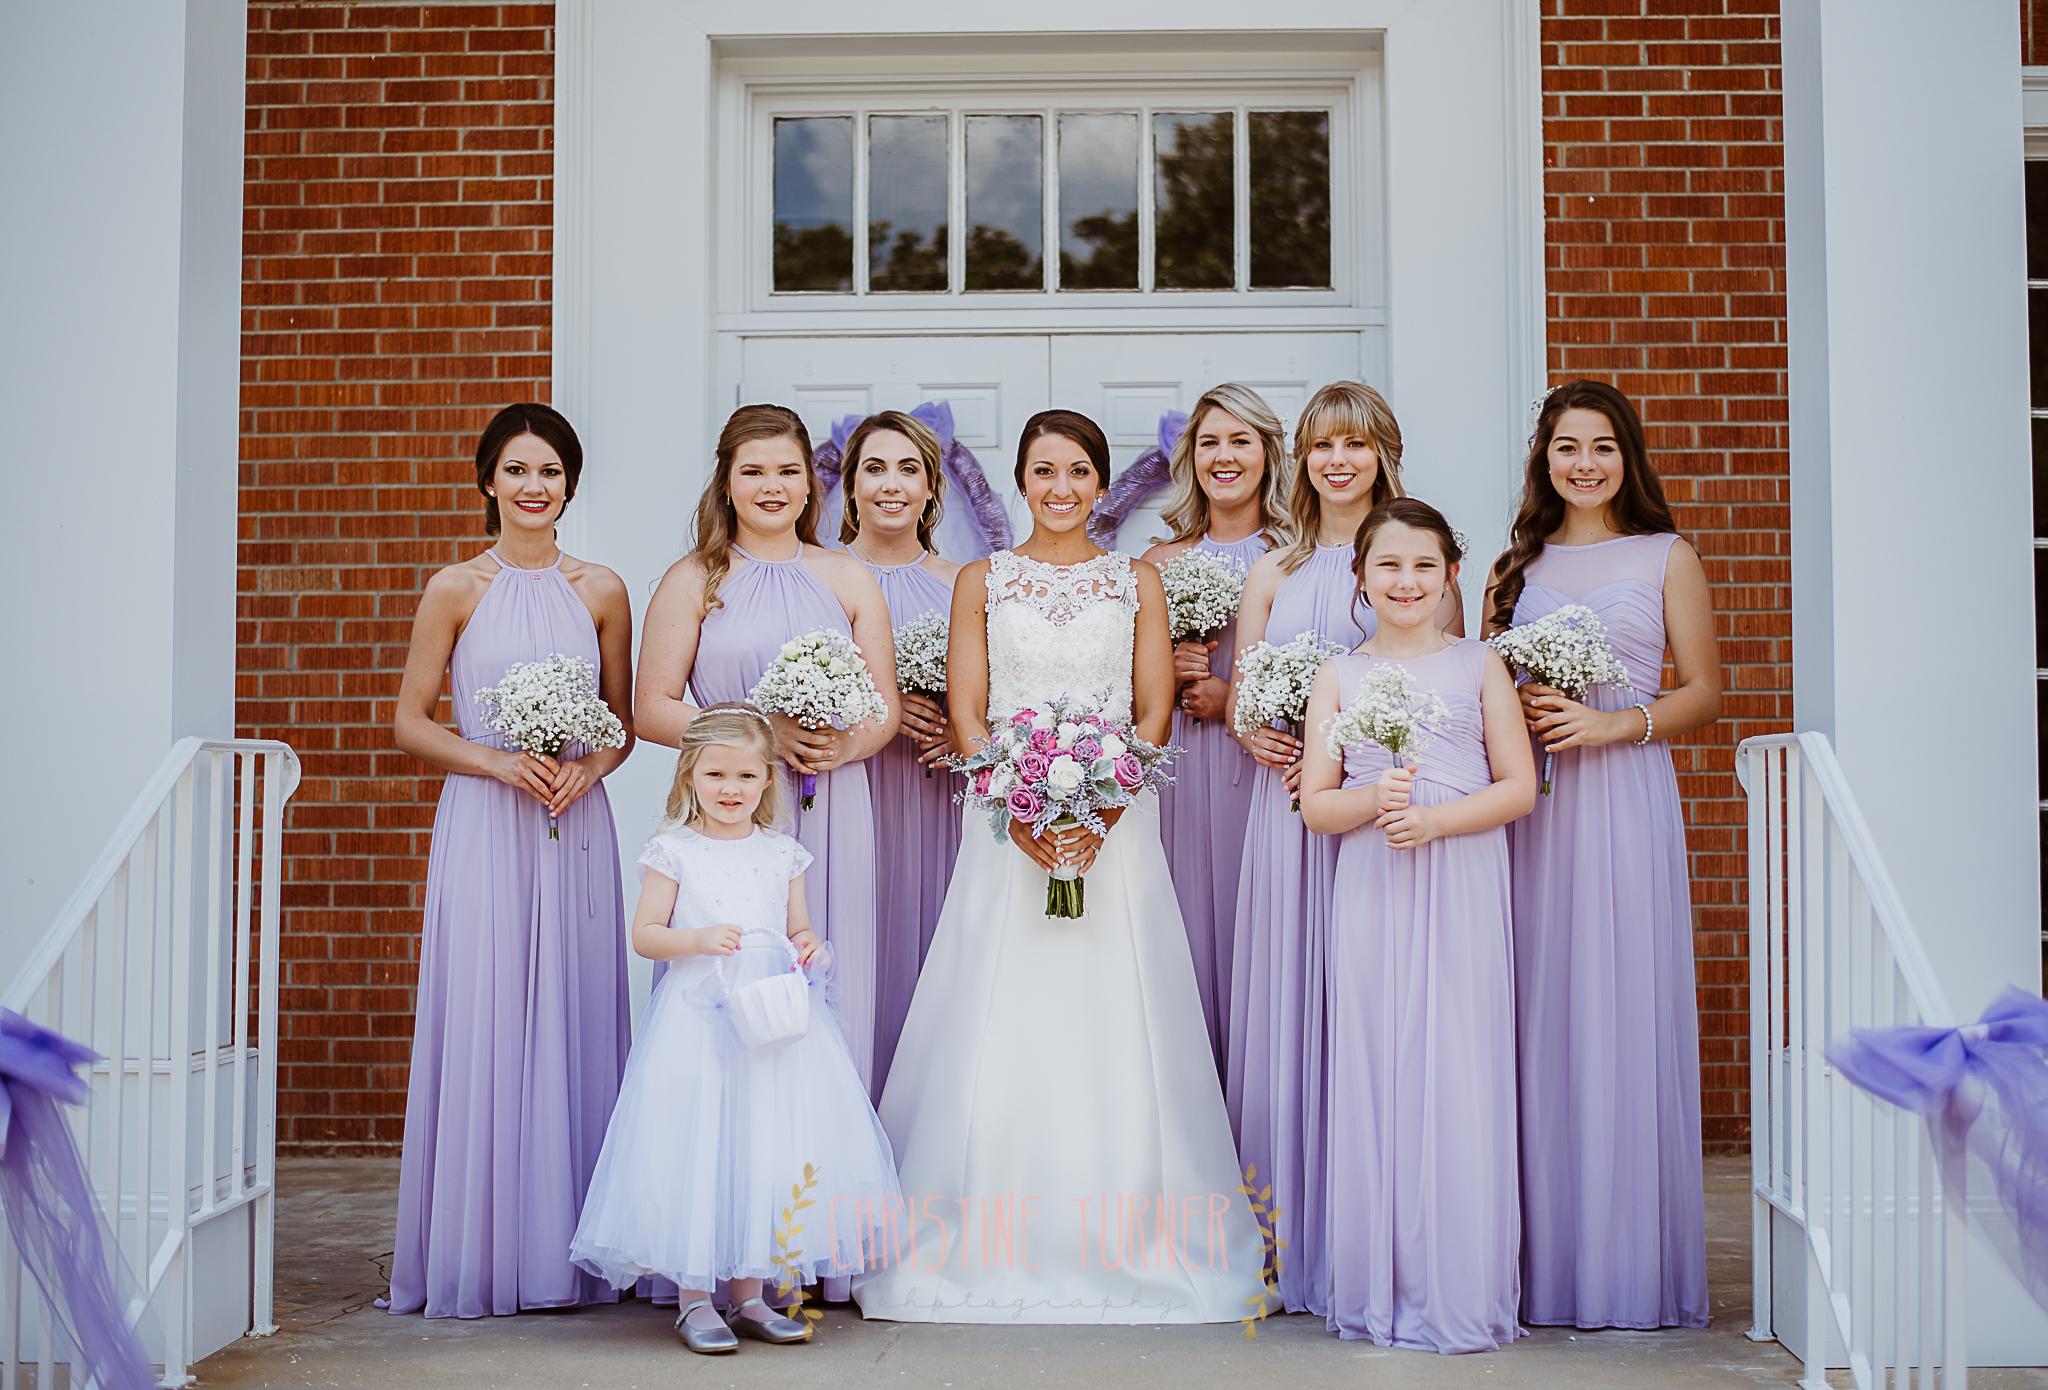 Johnston Wedding (2 of 3)